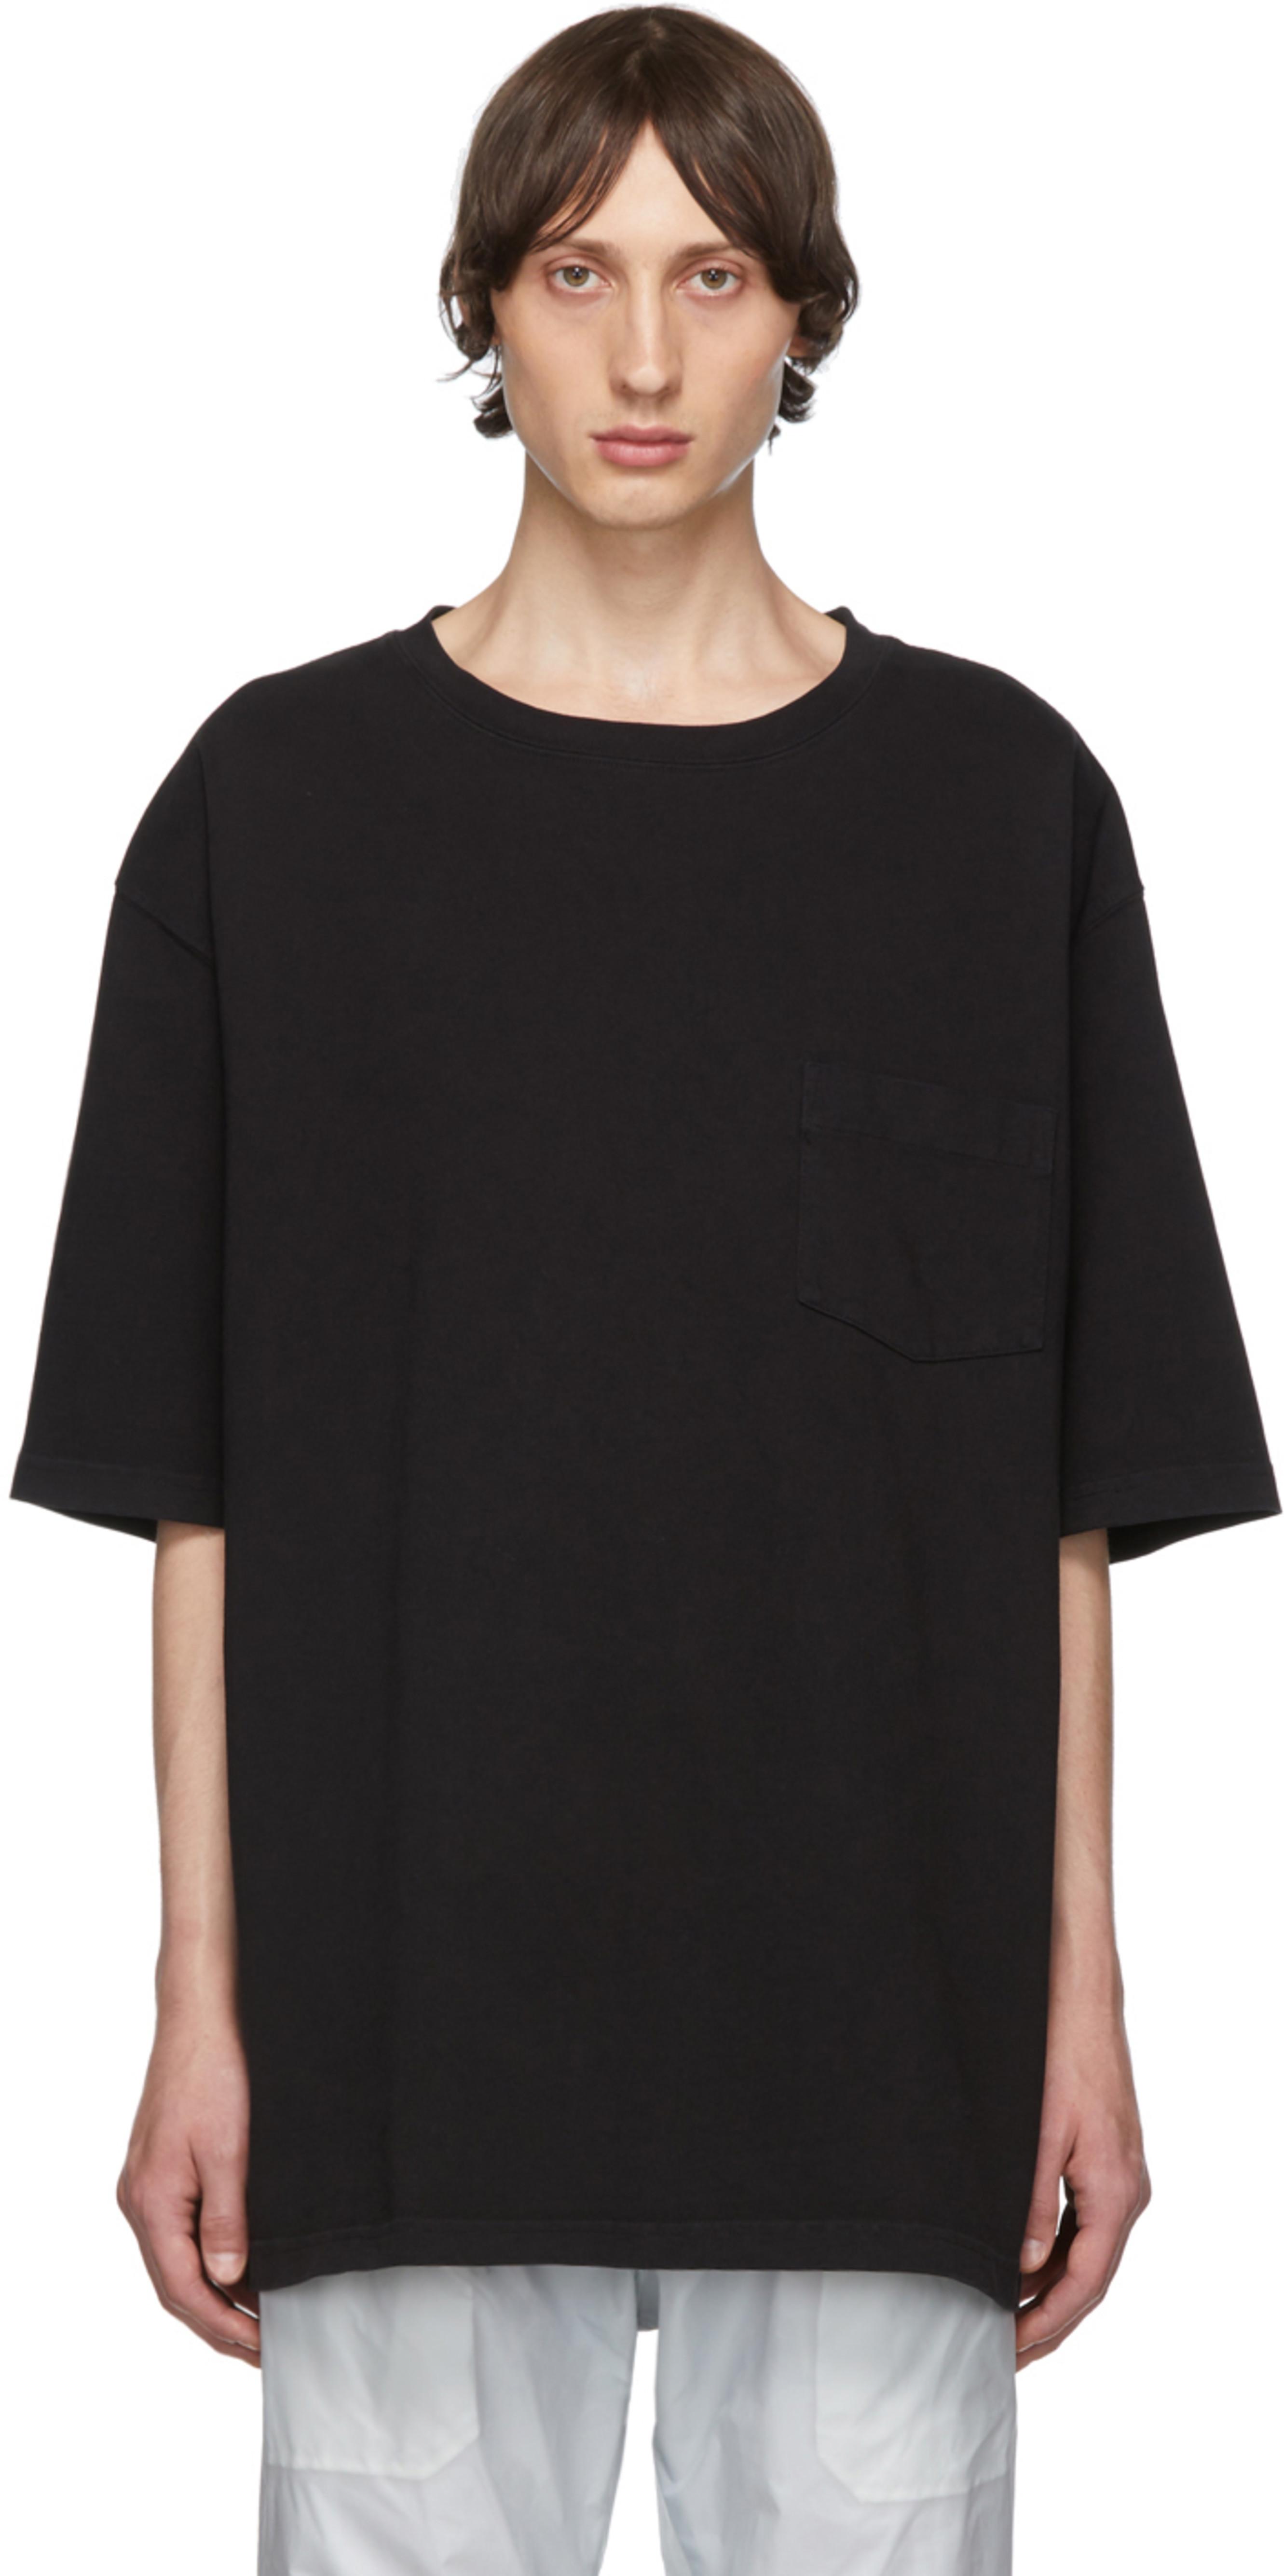 ebfb9a487 Designer t-shirts for Men | SSENSE